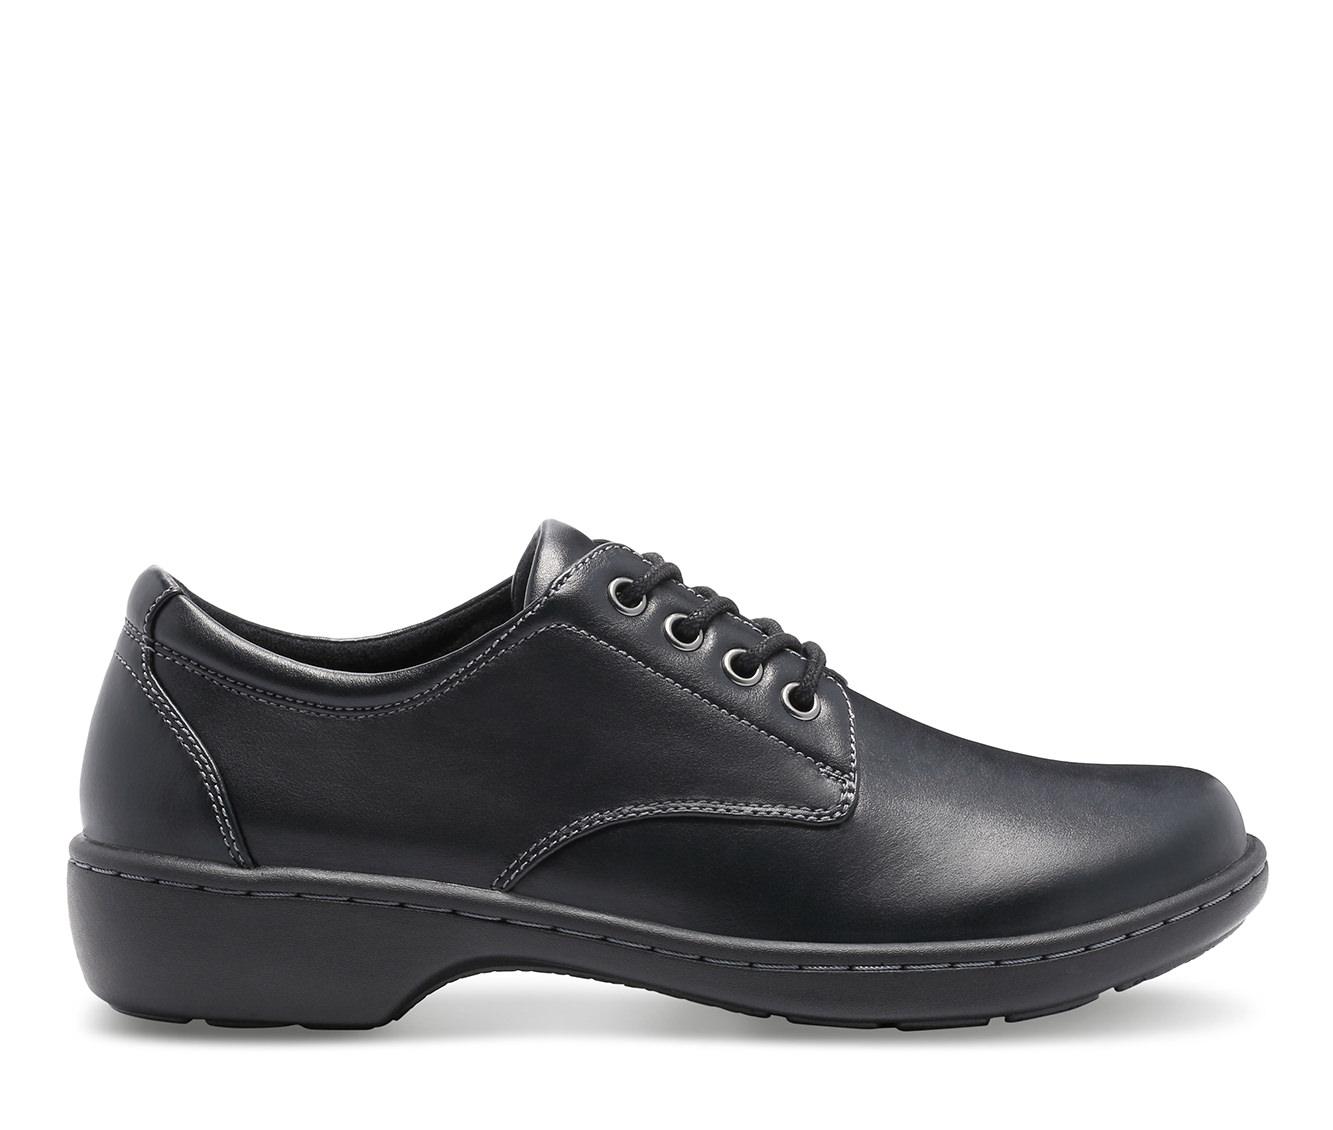 Eastland Pandora Women's Shoe (Black Faux Leather)